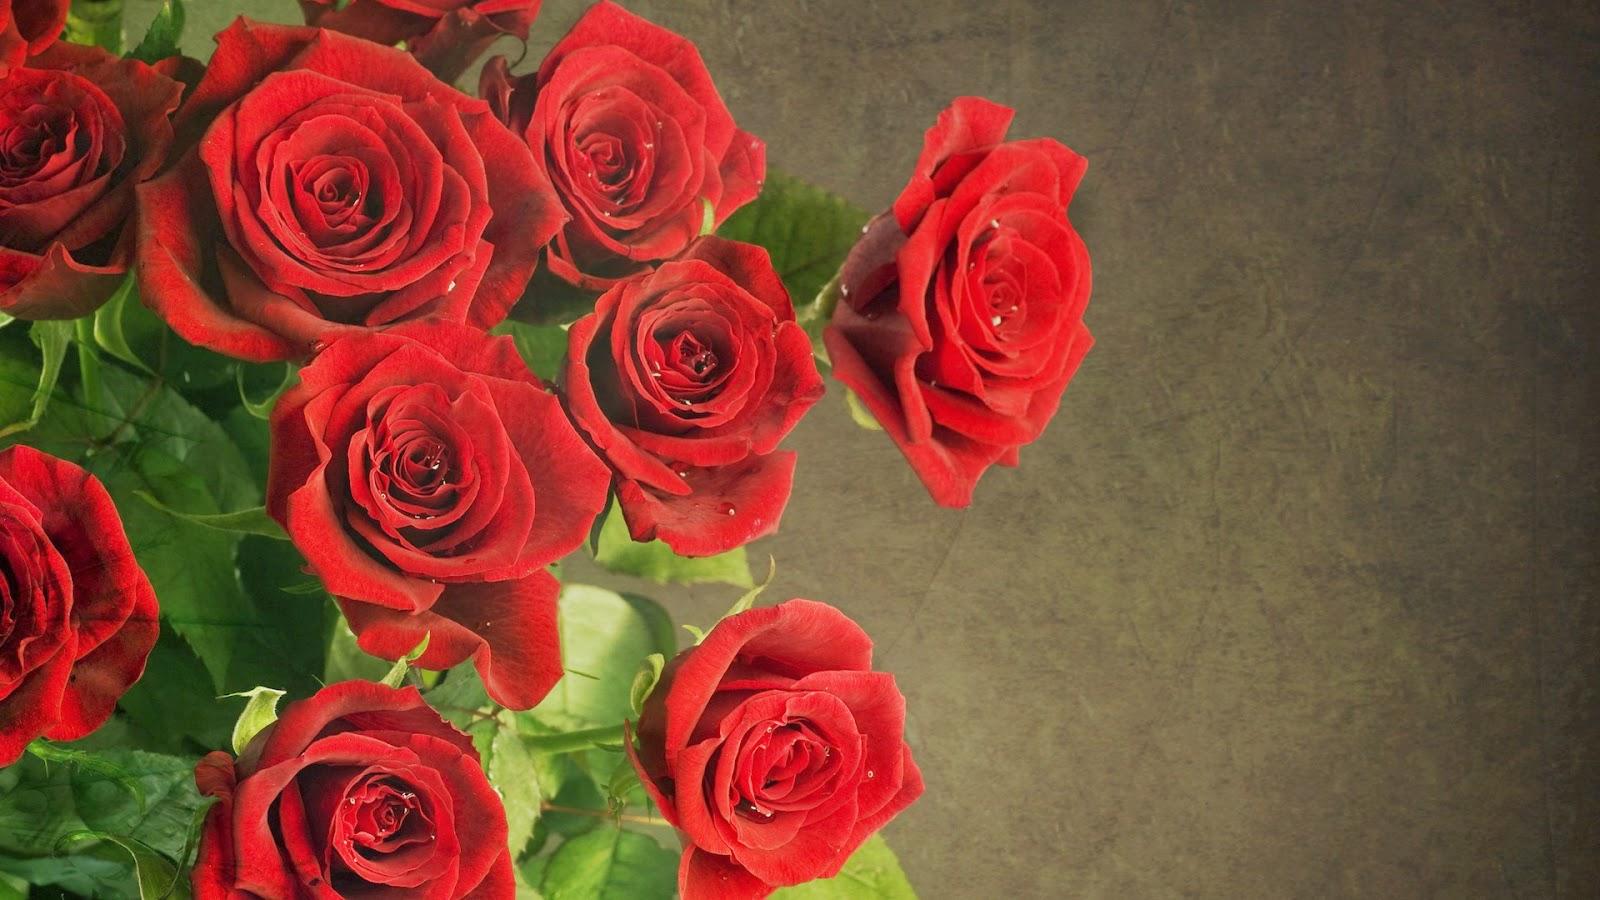 pin bunchofroseflowerswhitewallpaperredroses on